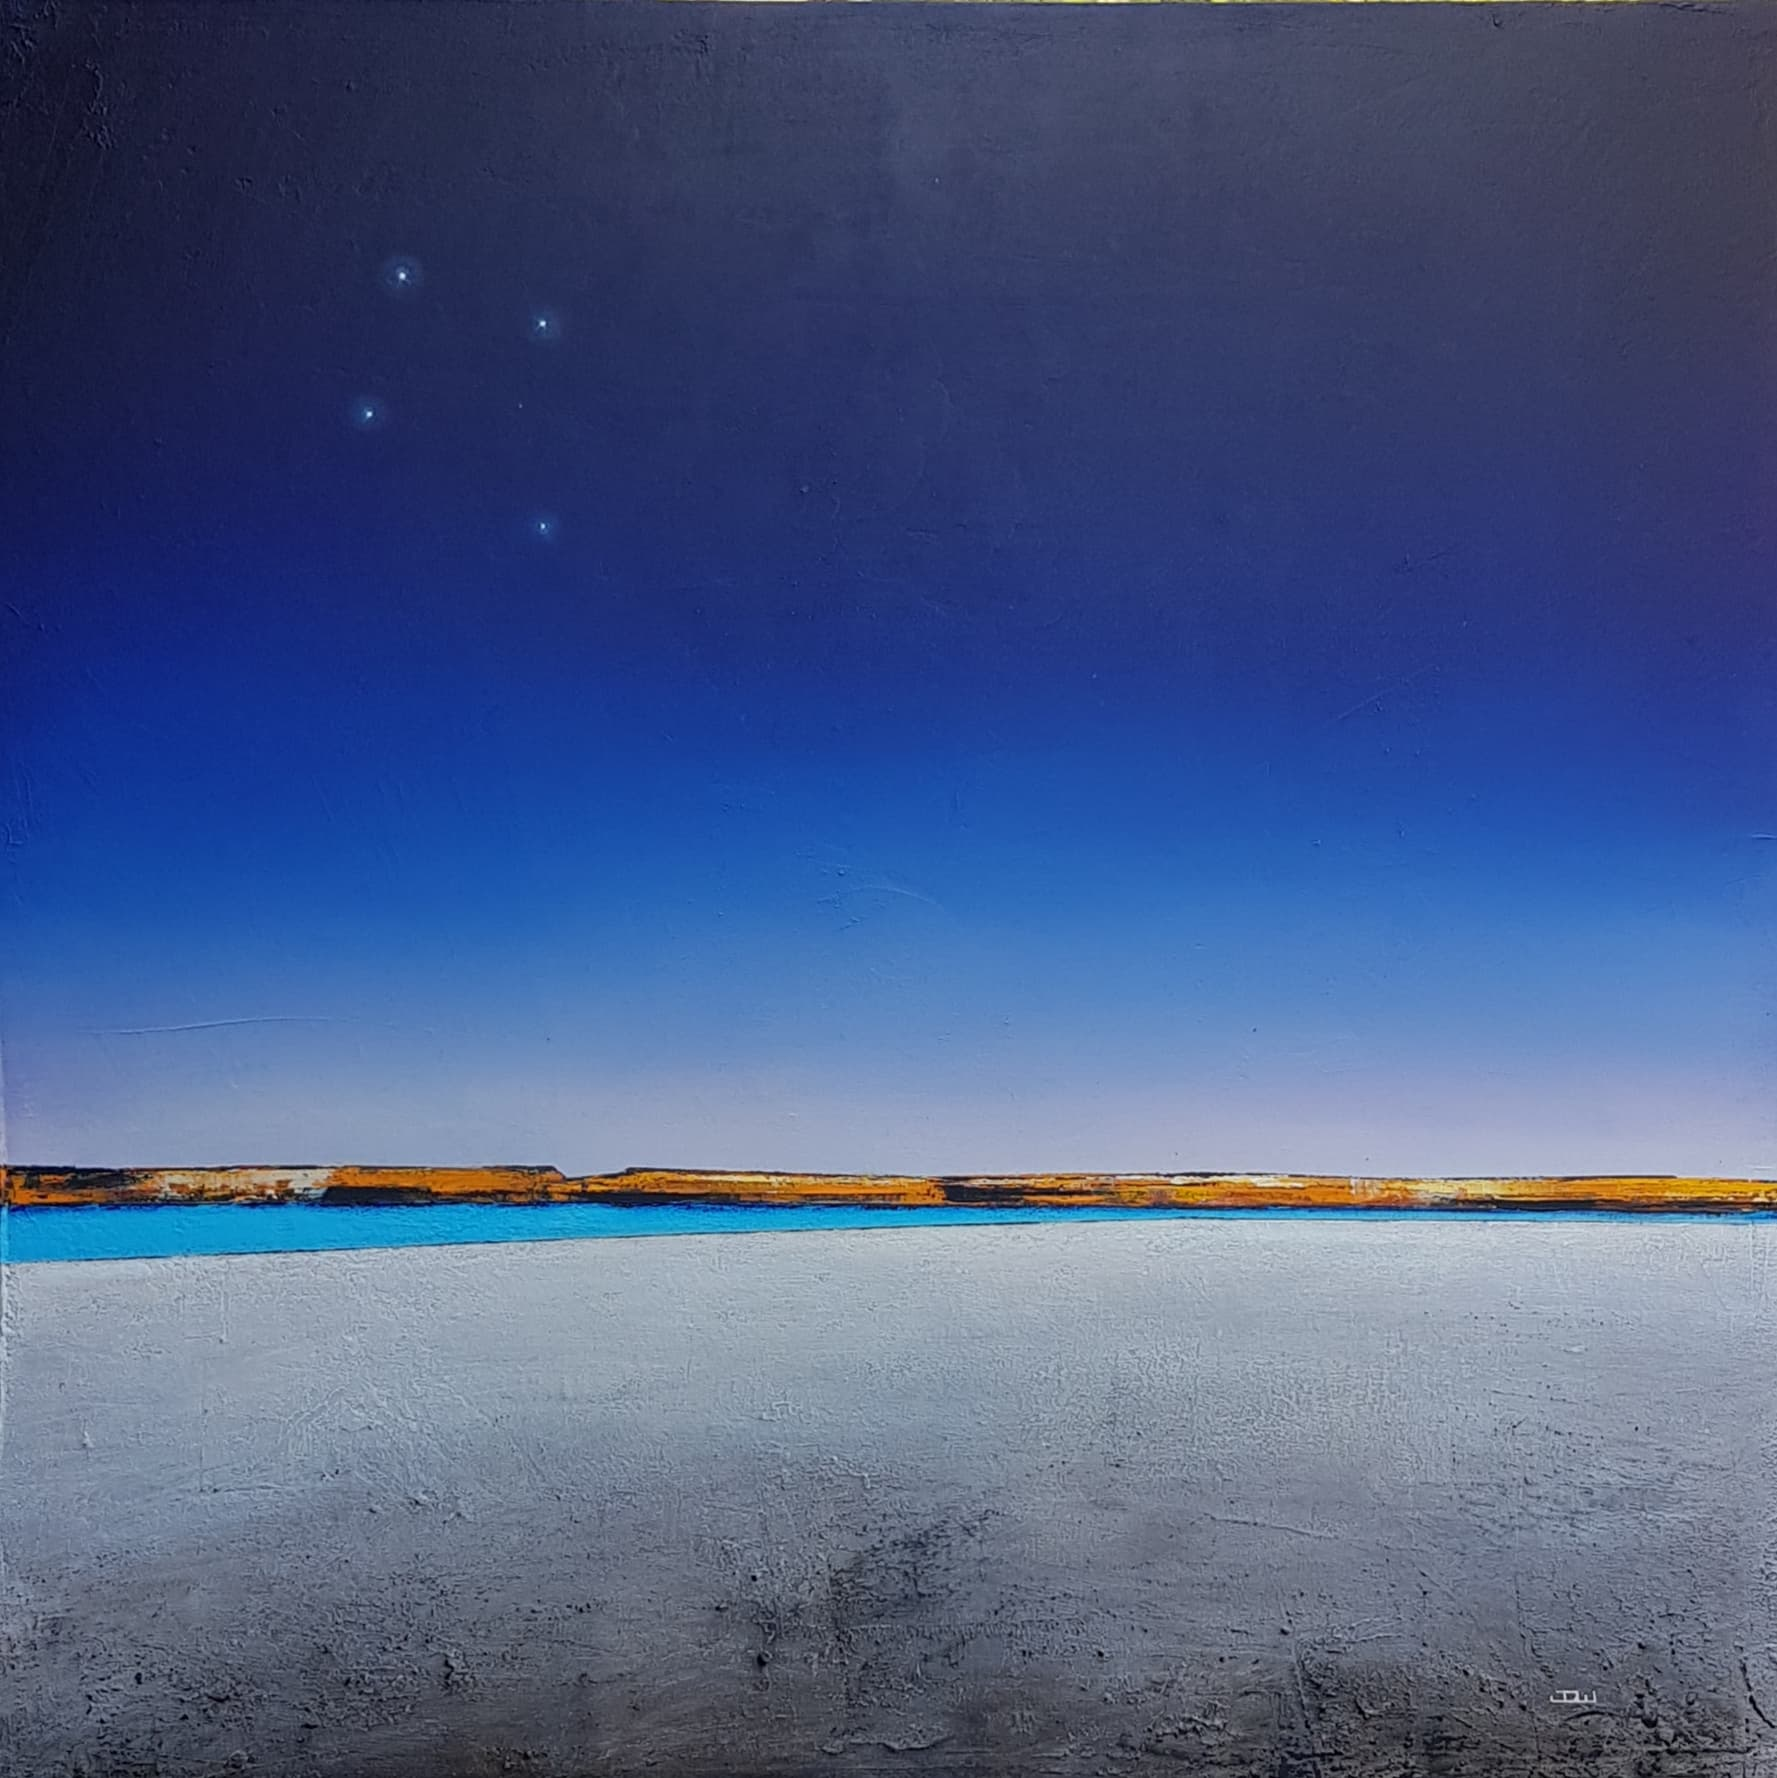 Josh Windram_Across The Universe_2019_Acrylic on canvas_90x90cm.jpg